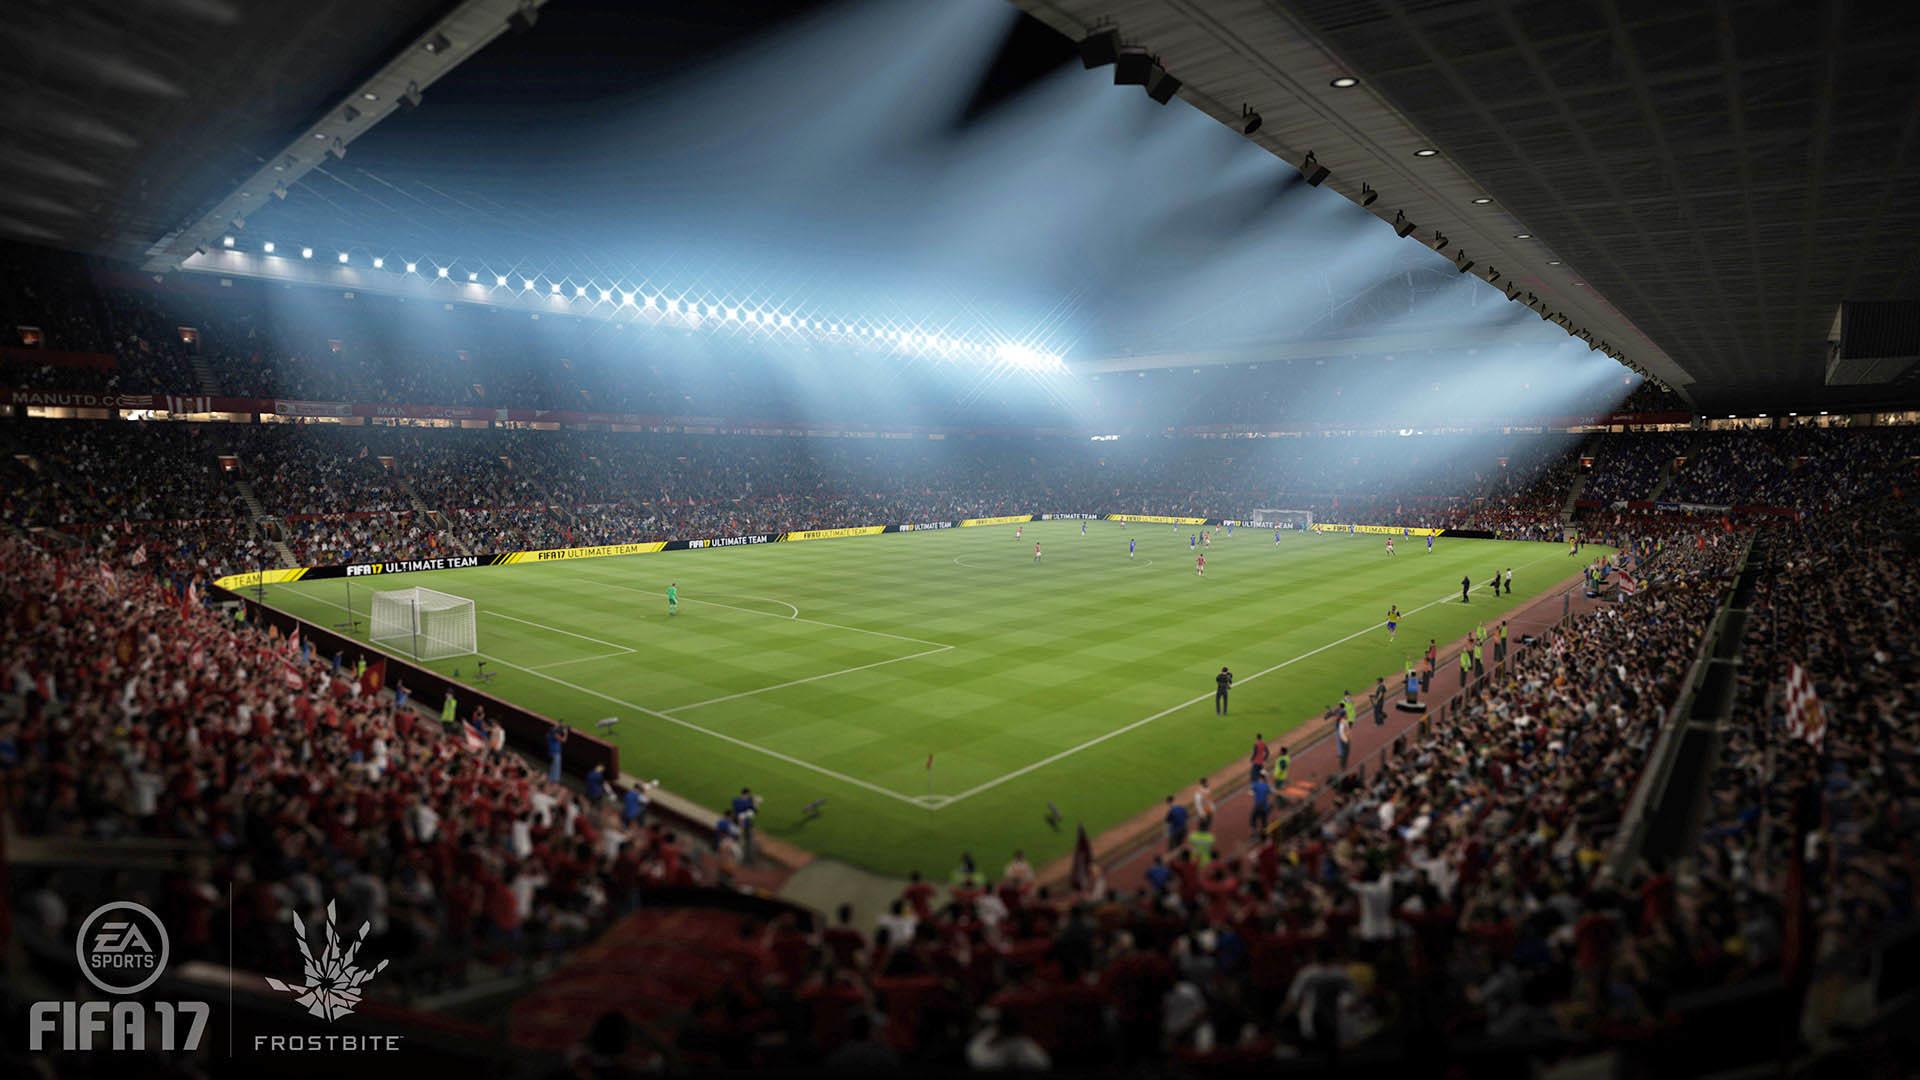 FIFA 17 Stadium – Frostbite wallpaper